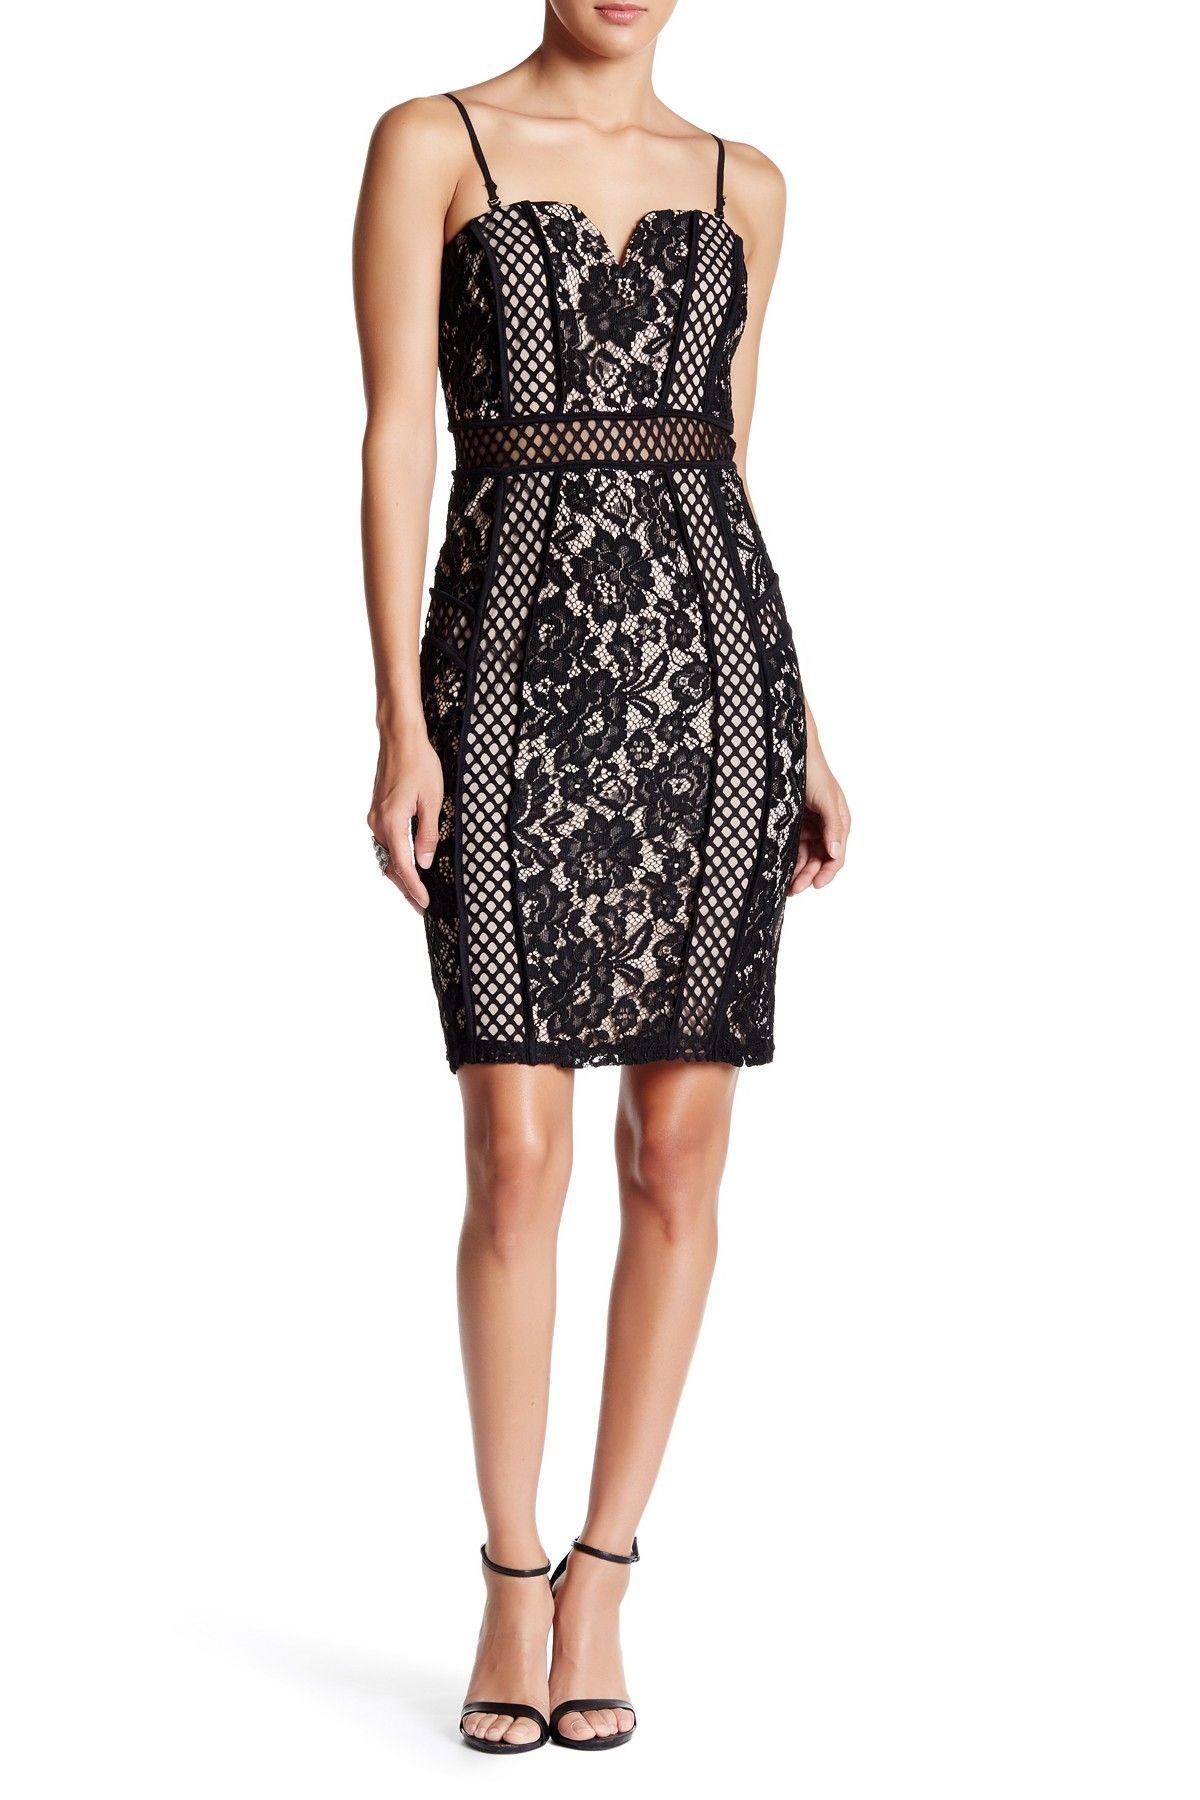 Yoana baraschi celestial garden lace dress nordstrom rack - Just Me Lace Bandeau Dress